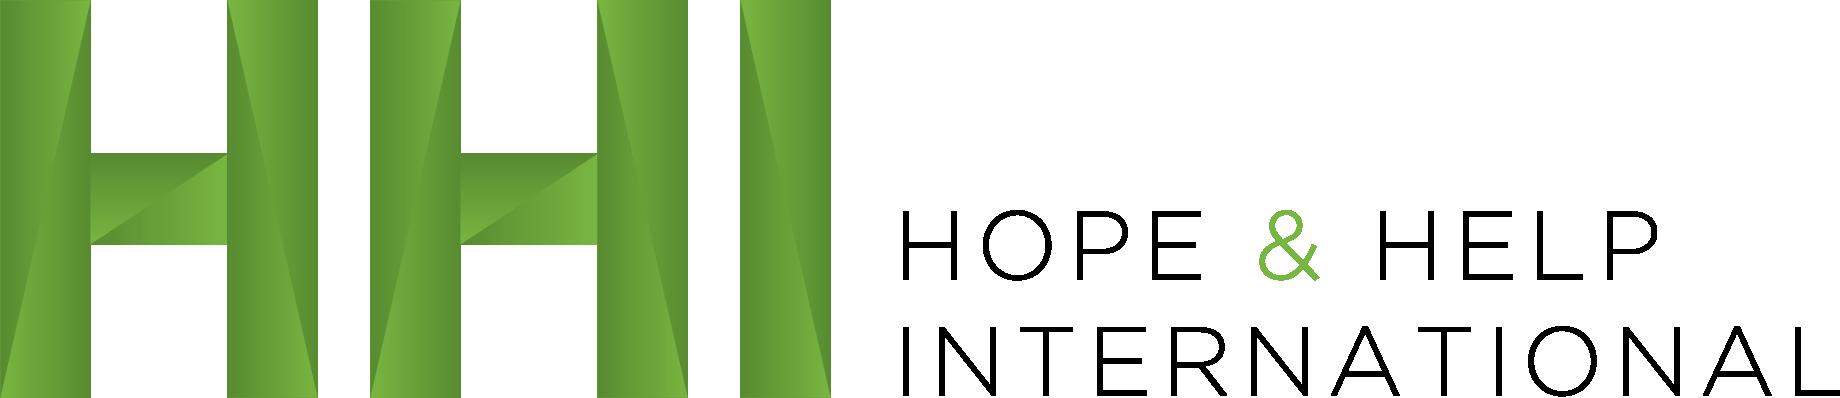 HHI Prism Green